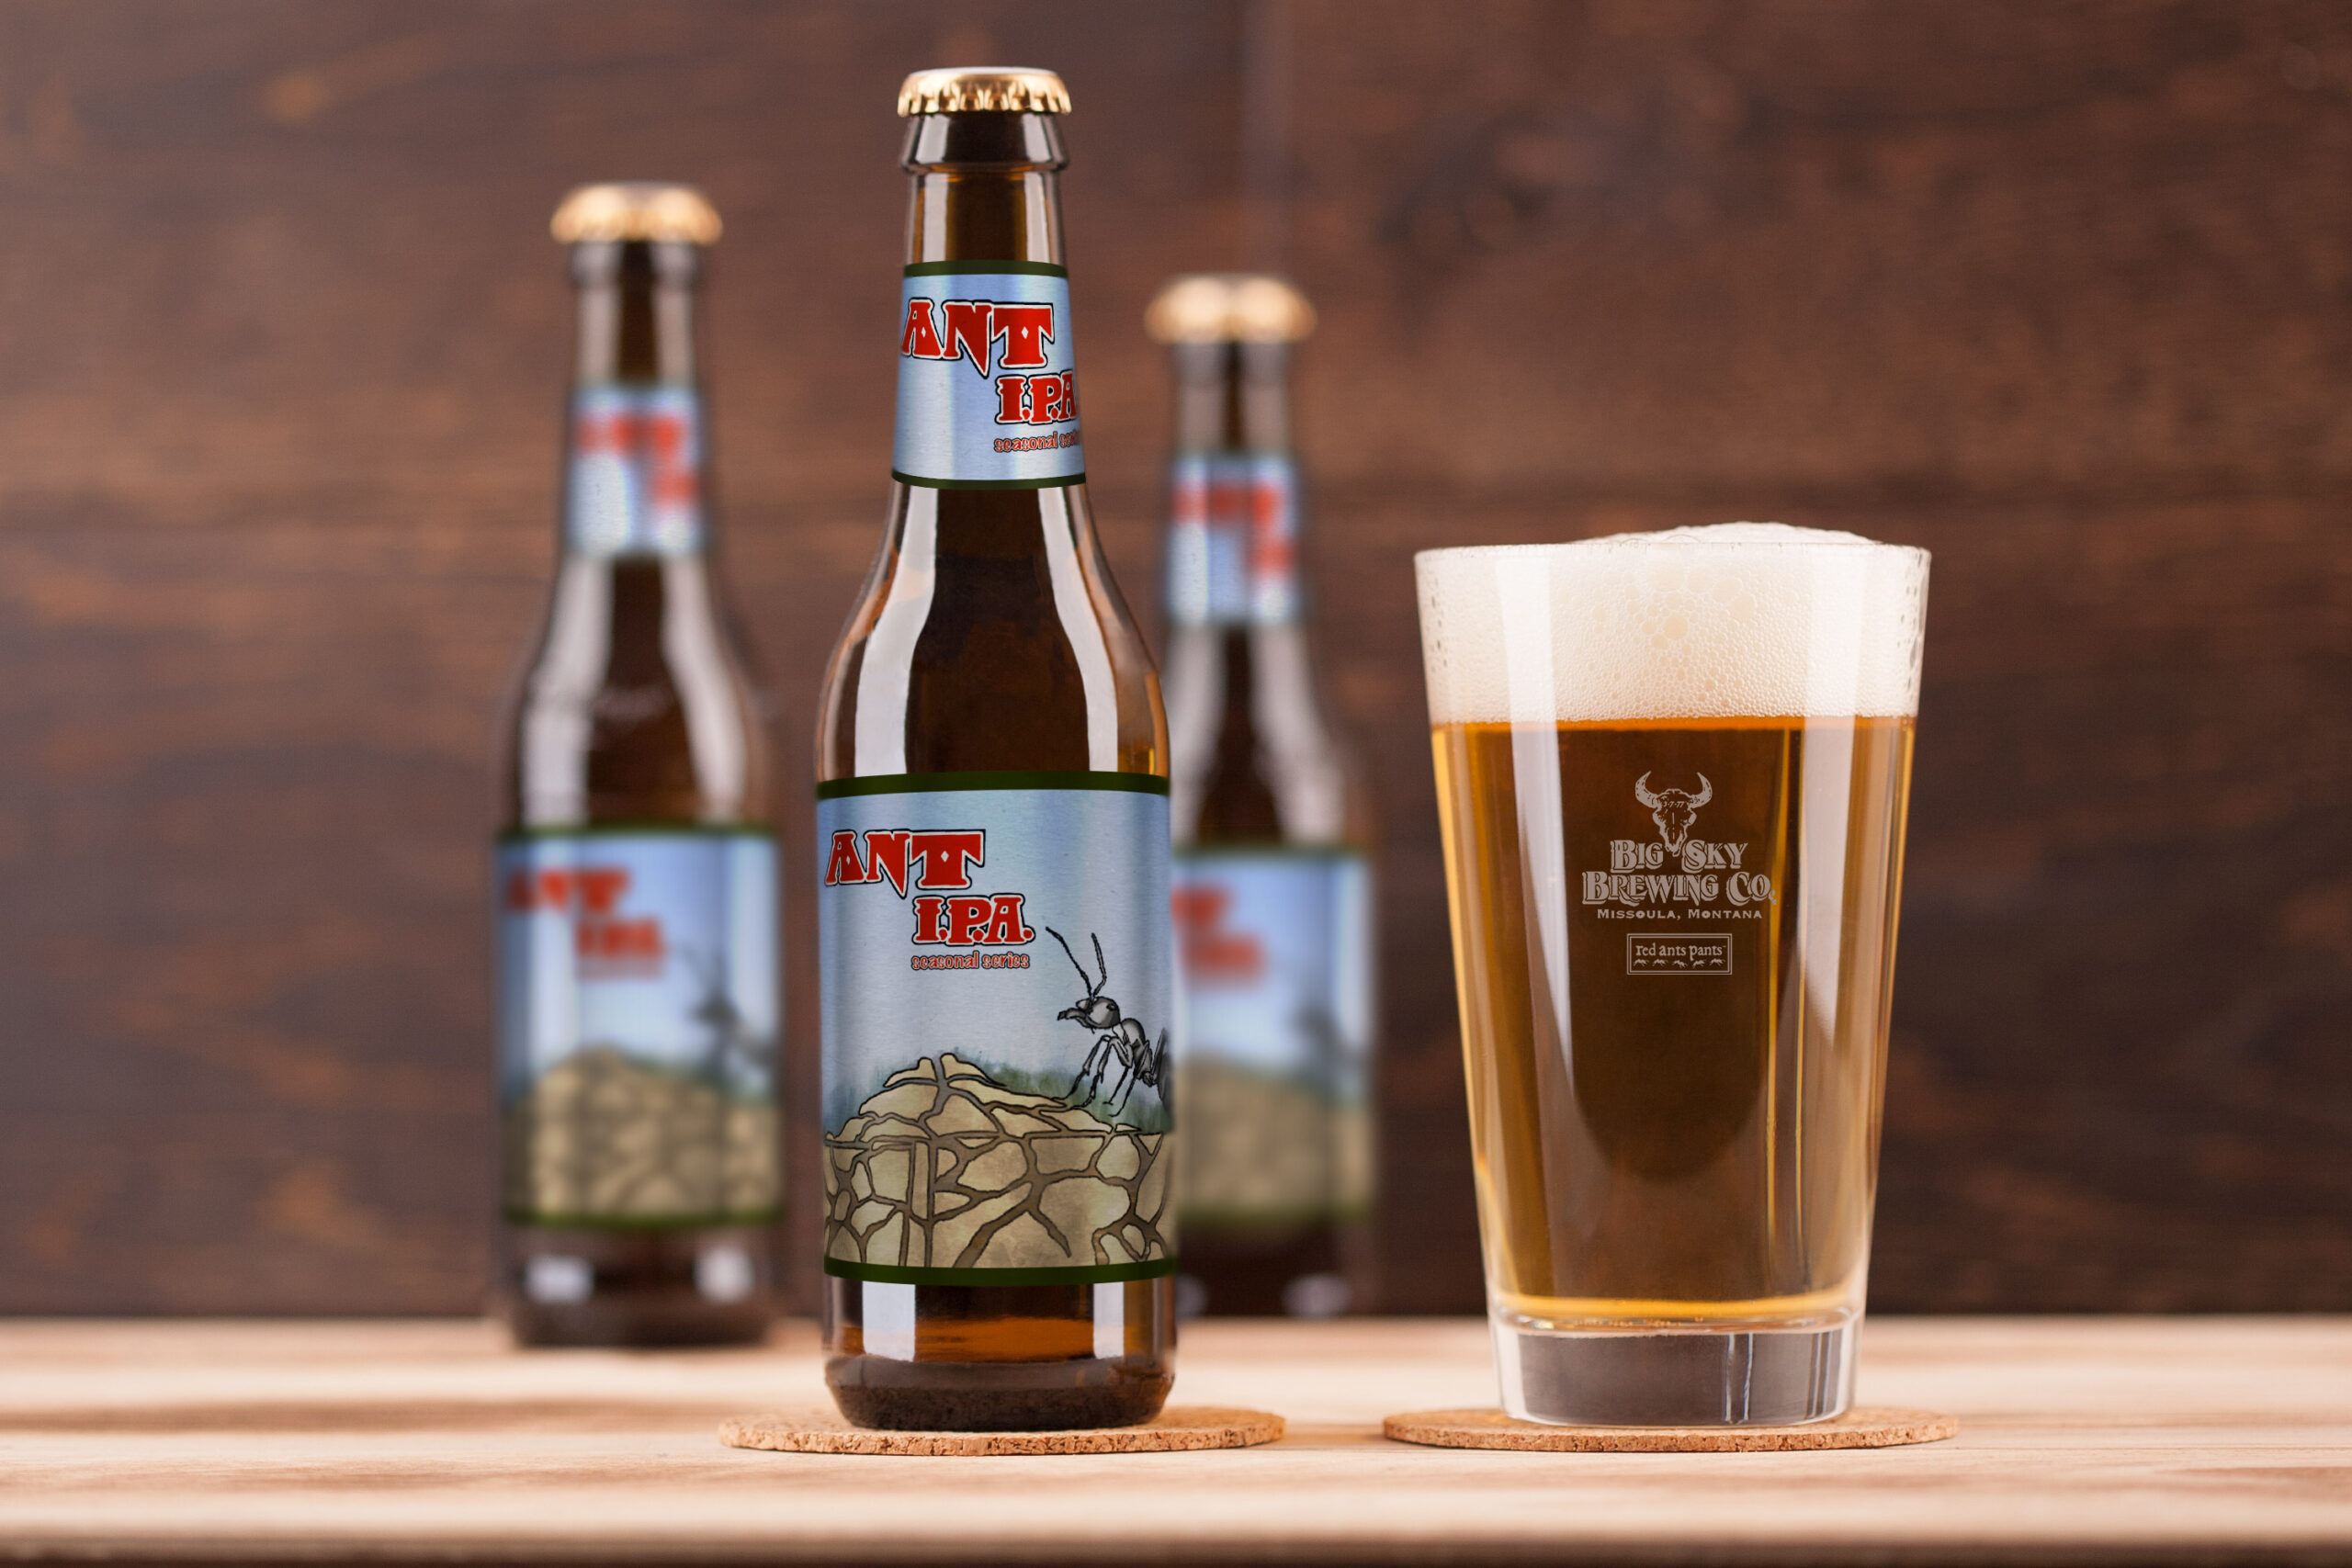 Ant-IPA-RAP-Beer-Bottle